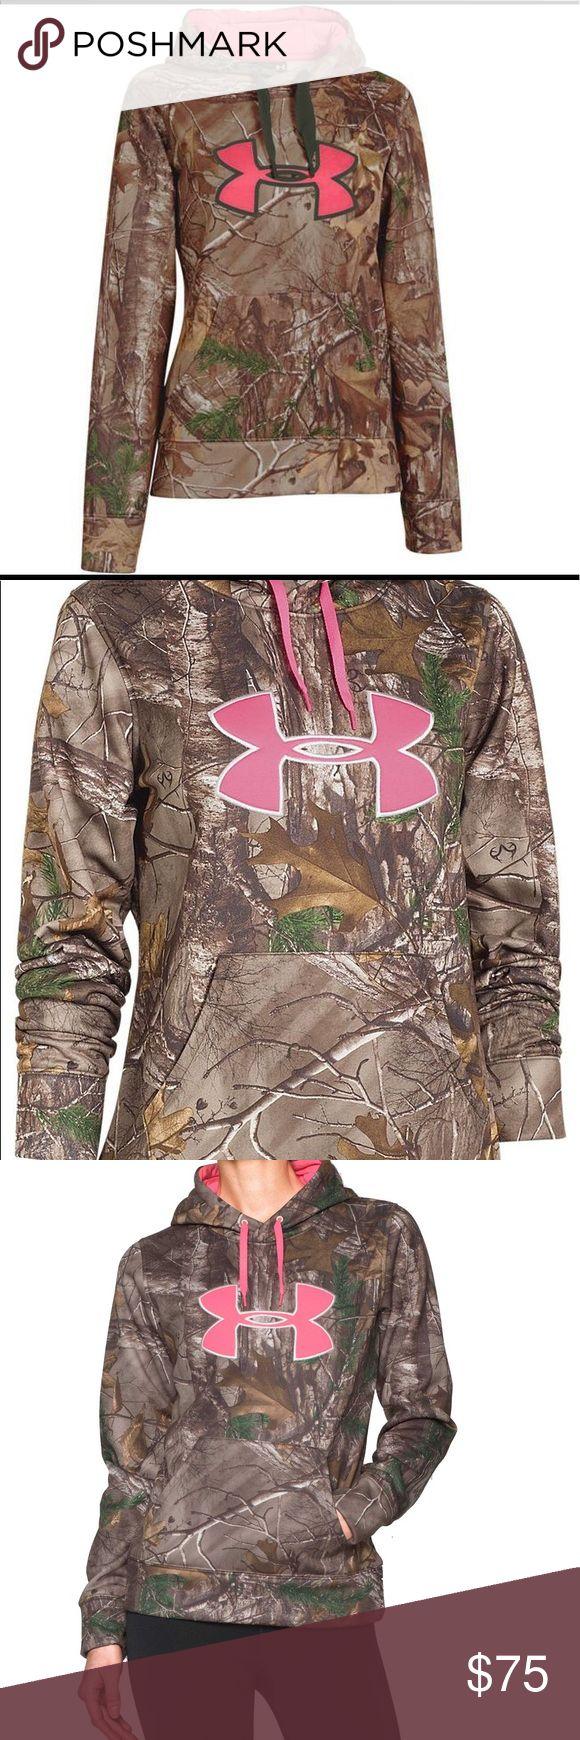 Under Armour camo hoodie S NWT pink logo $75 Under Armour camo hoodie S NWT pink logo $75 new camouflage Under Armour Tops Sweatshirts & Hoodies